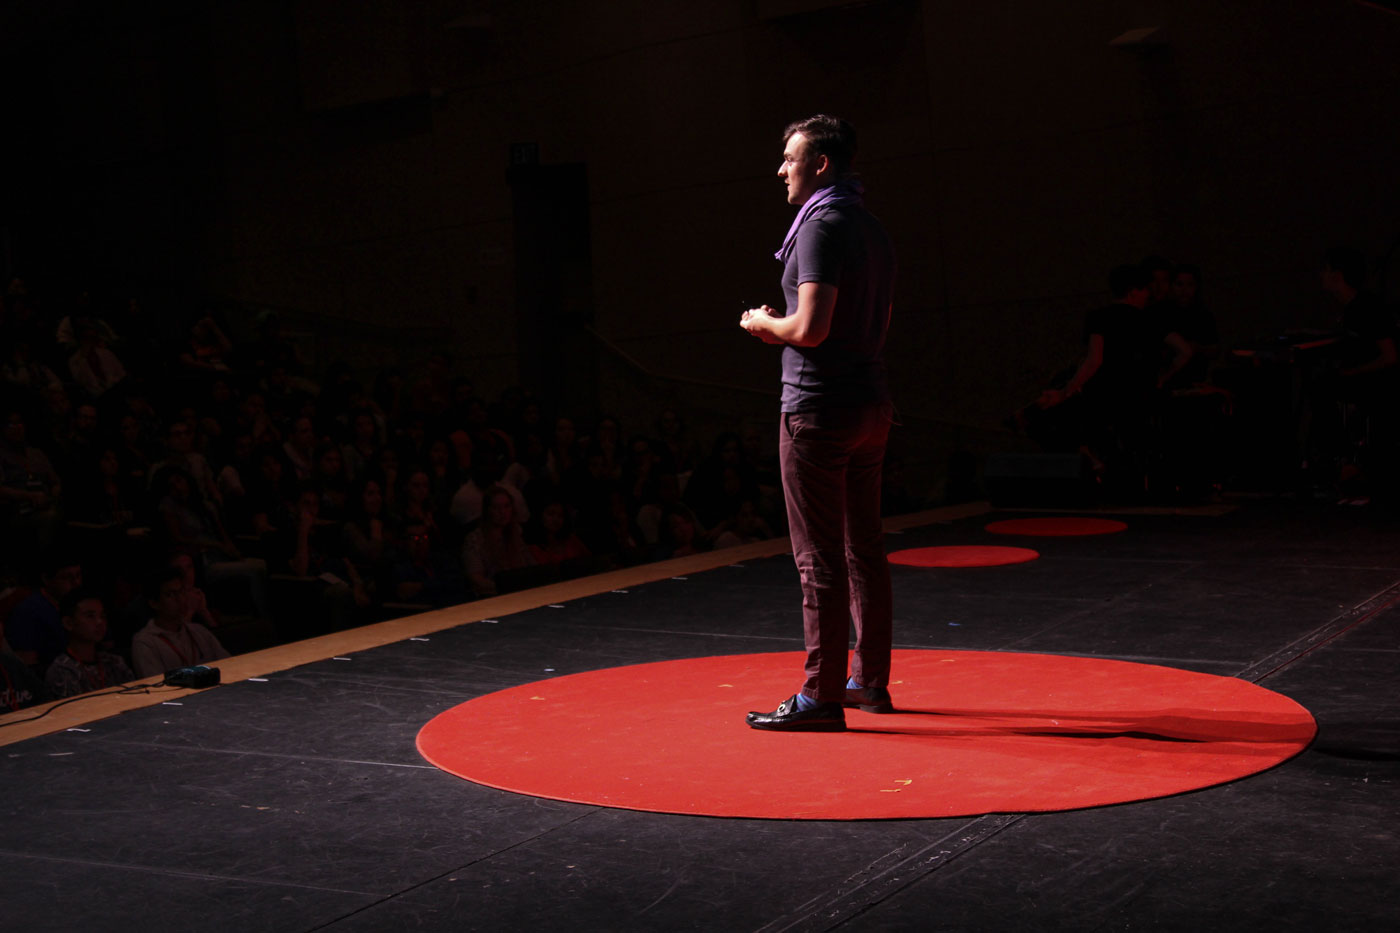 Sam Killermann giving a talk at TEDxYOUTH San Diego in 2015